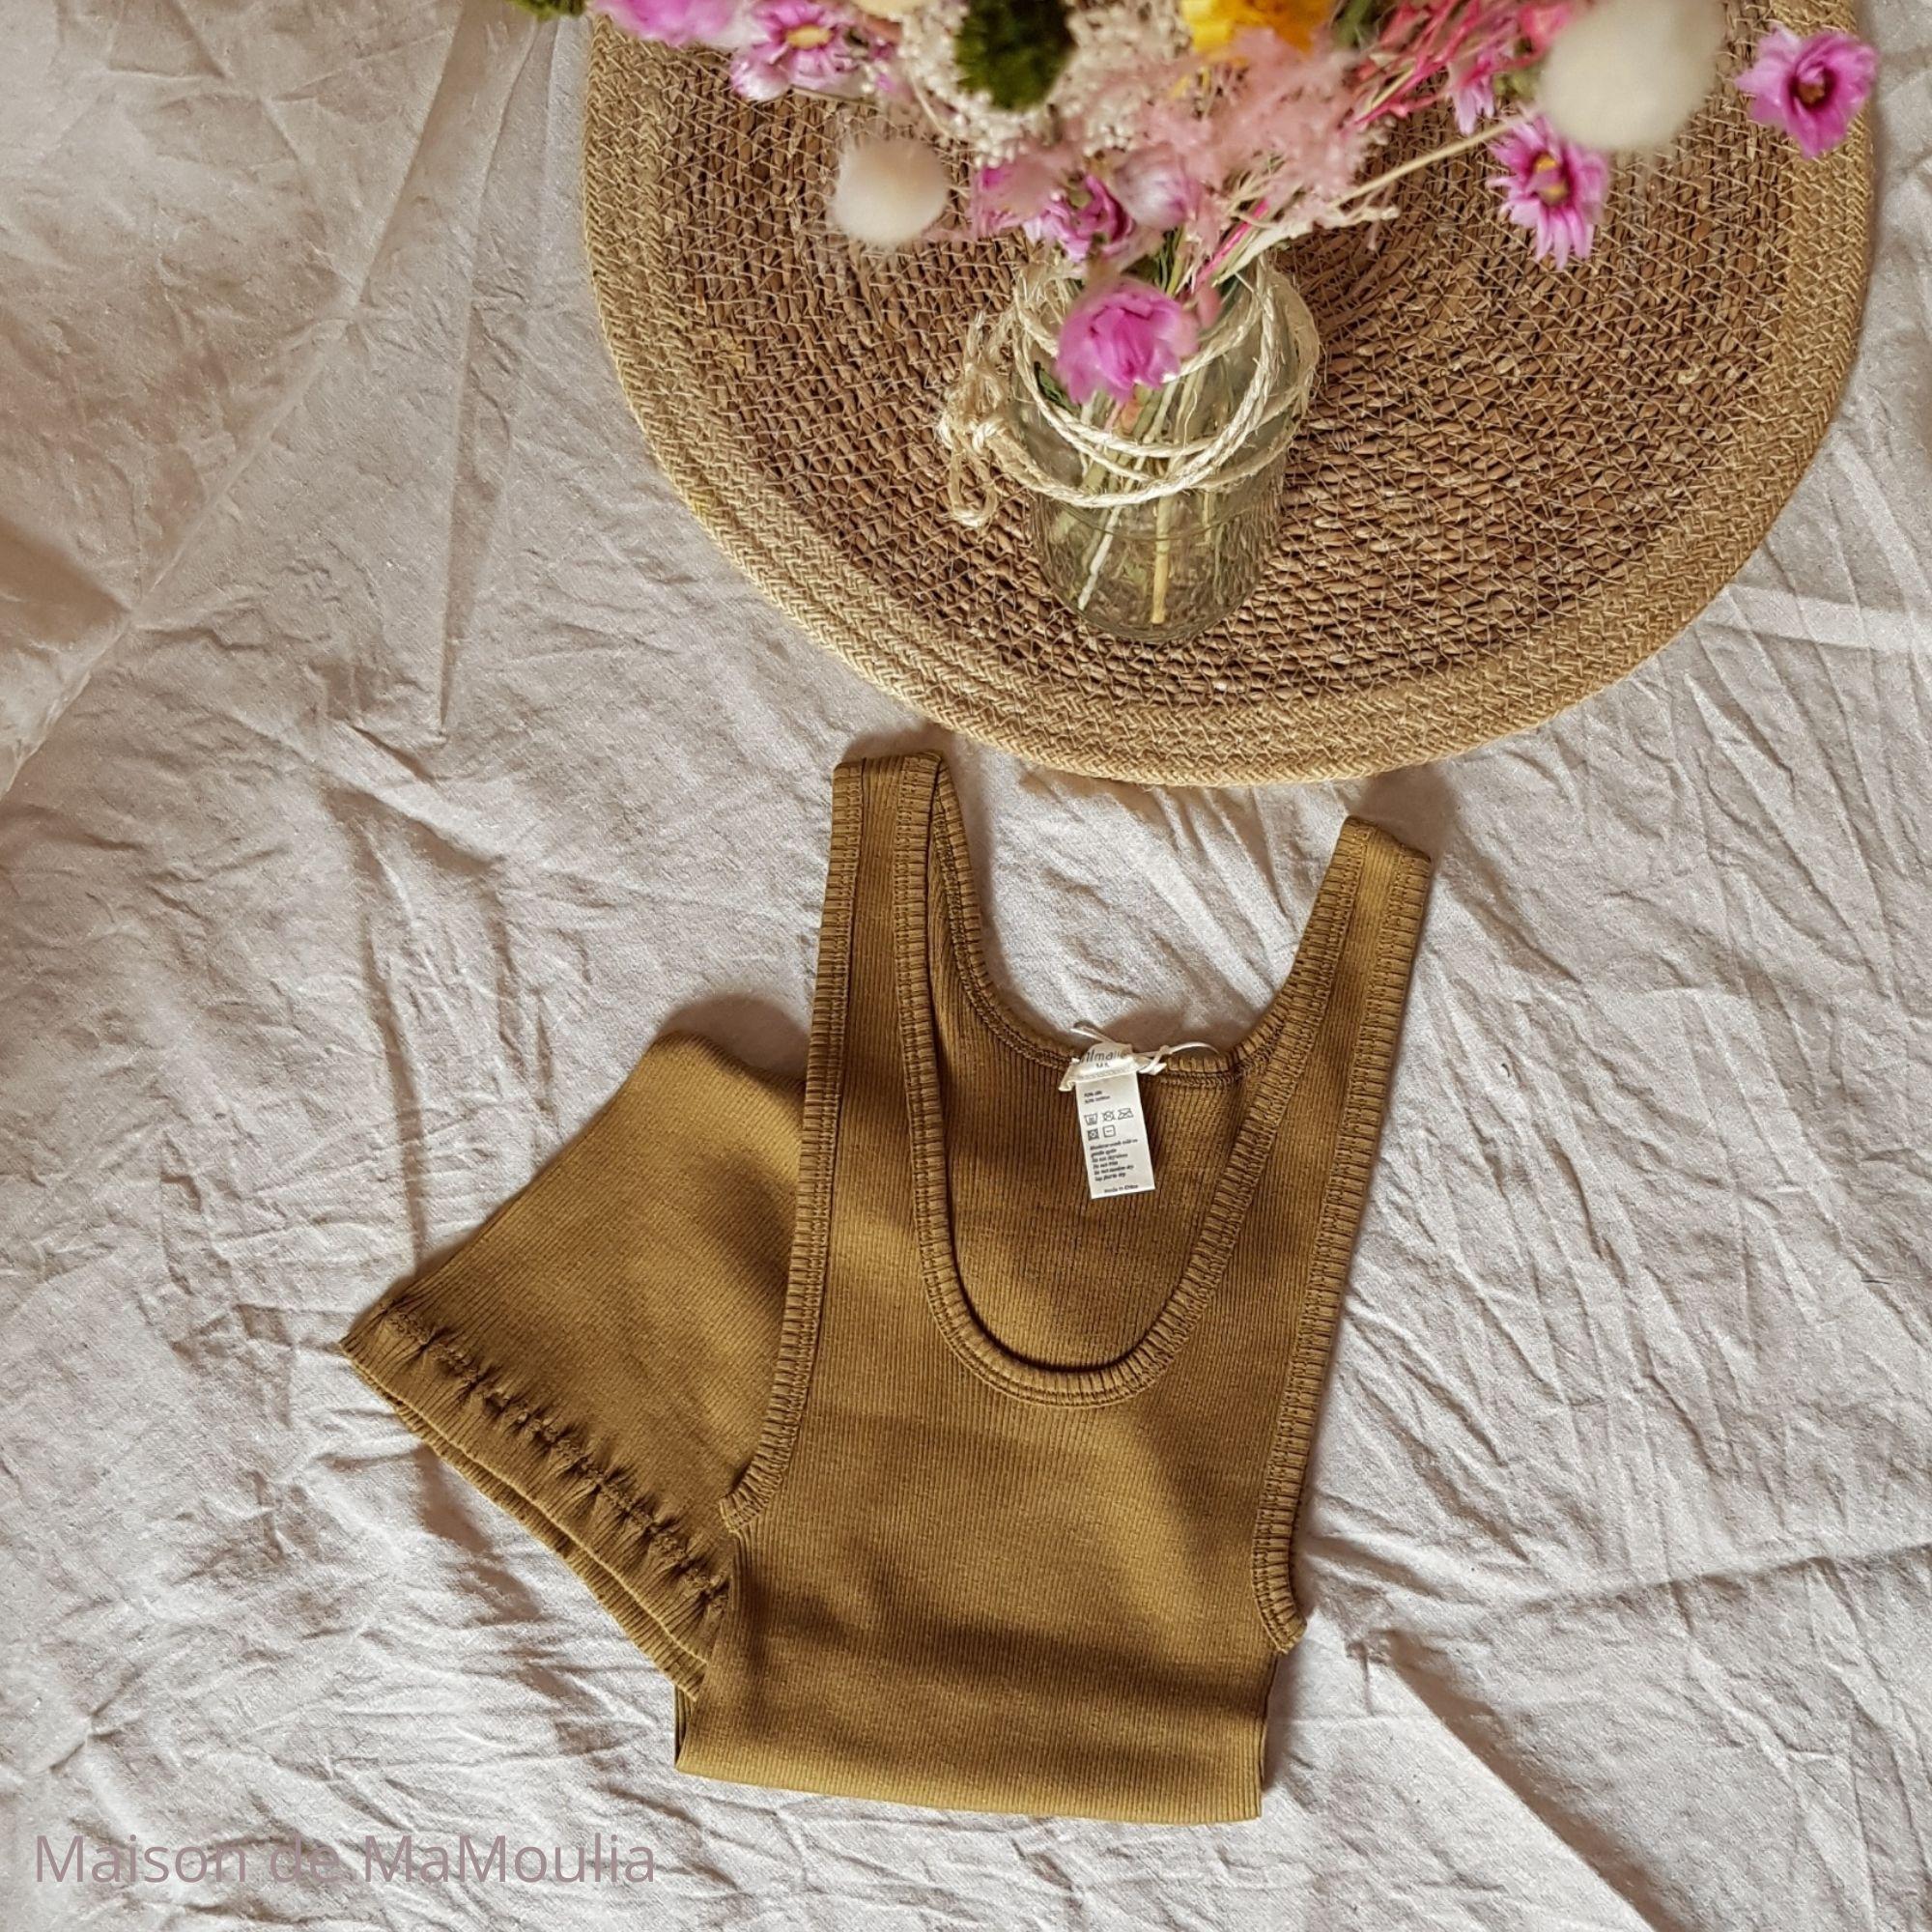 181-11 - Gudrun - Seaweed-tshirt-debardeur-femme-soie-coton-maison-de-mamoulia-vert-algue